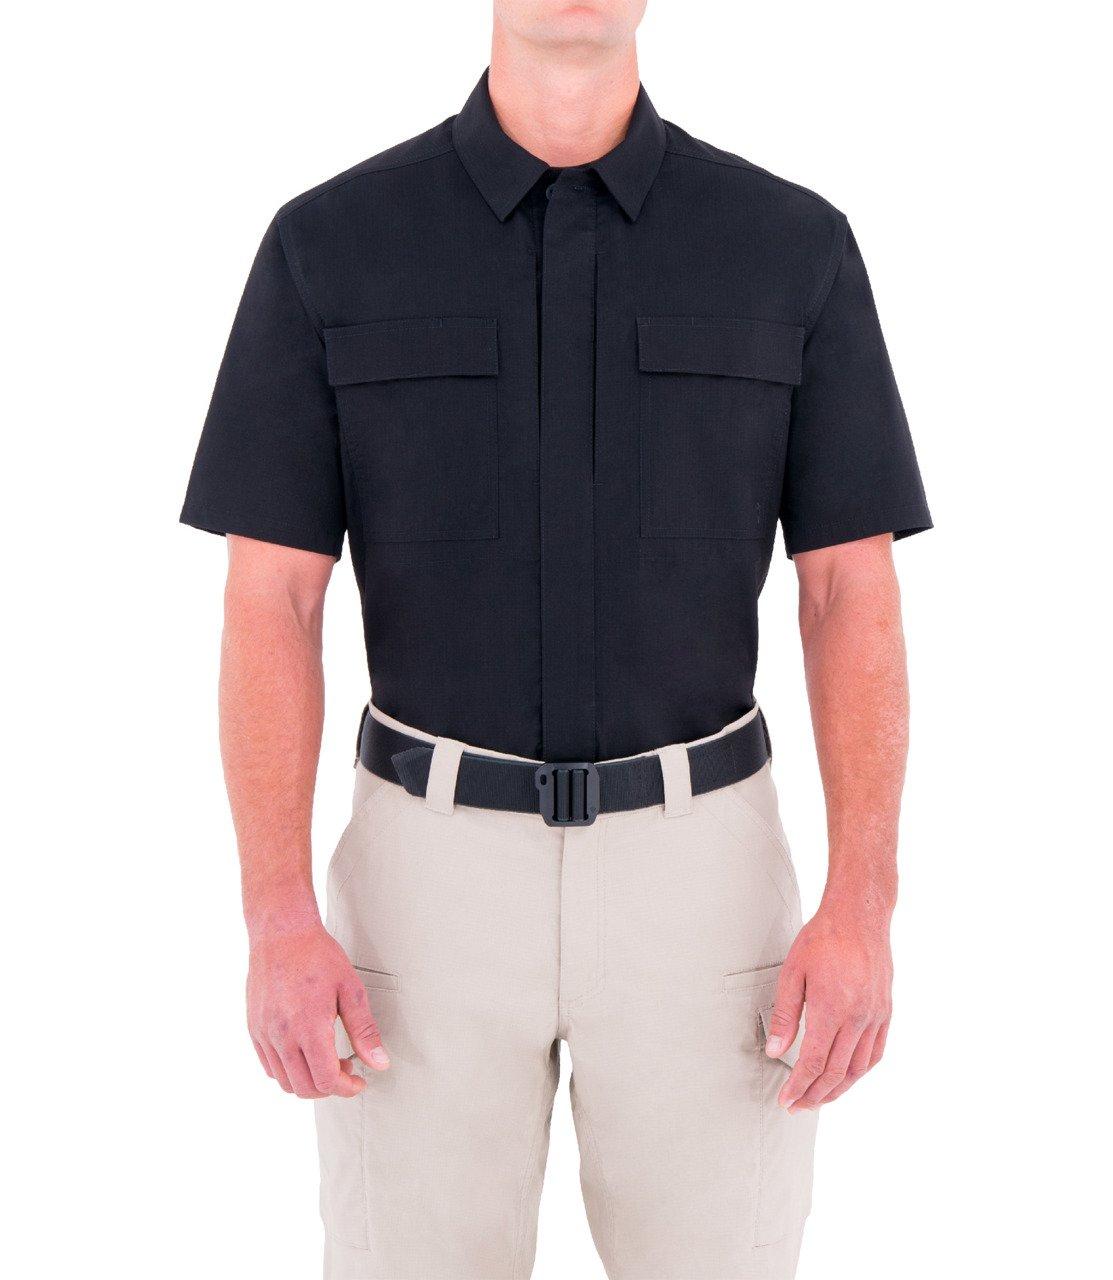 ece64e37 Men's Specialist Short Sleeve BDU Shirt Black   Police, EMS & Fire ...